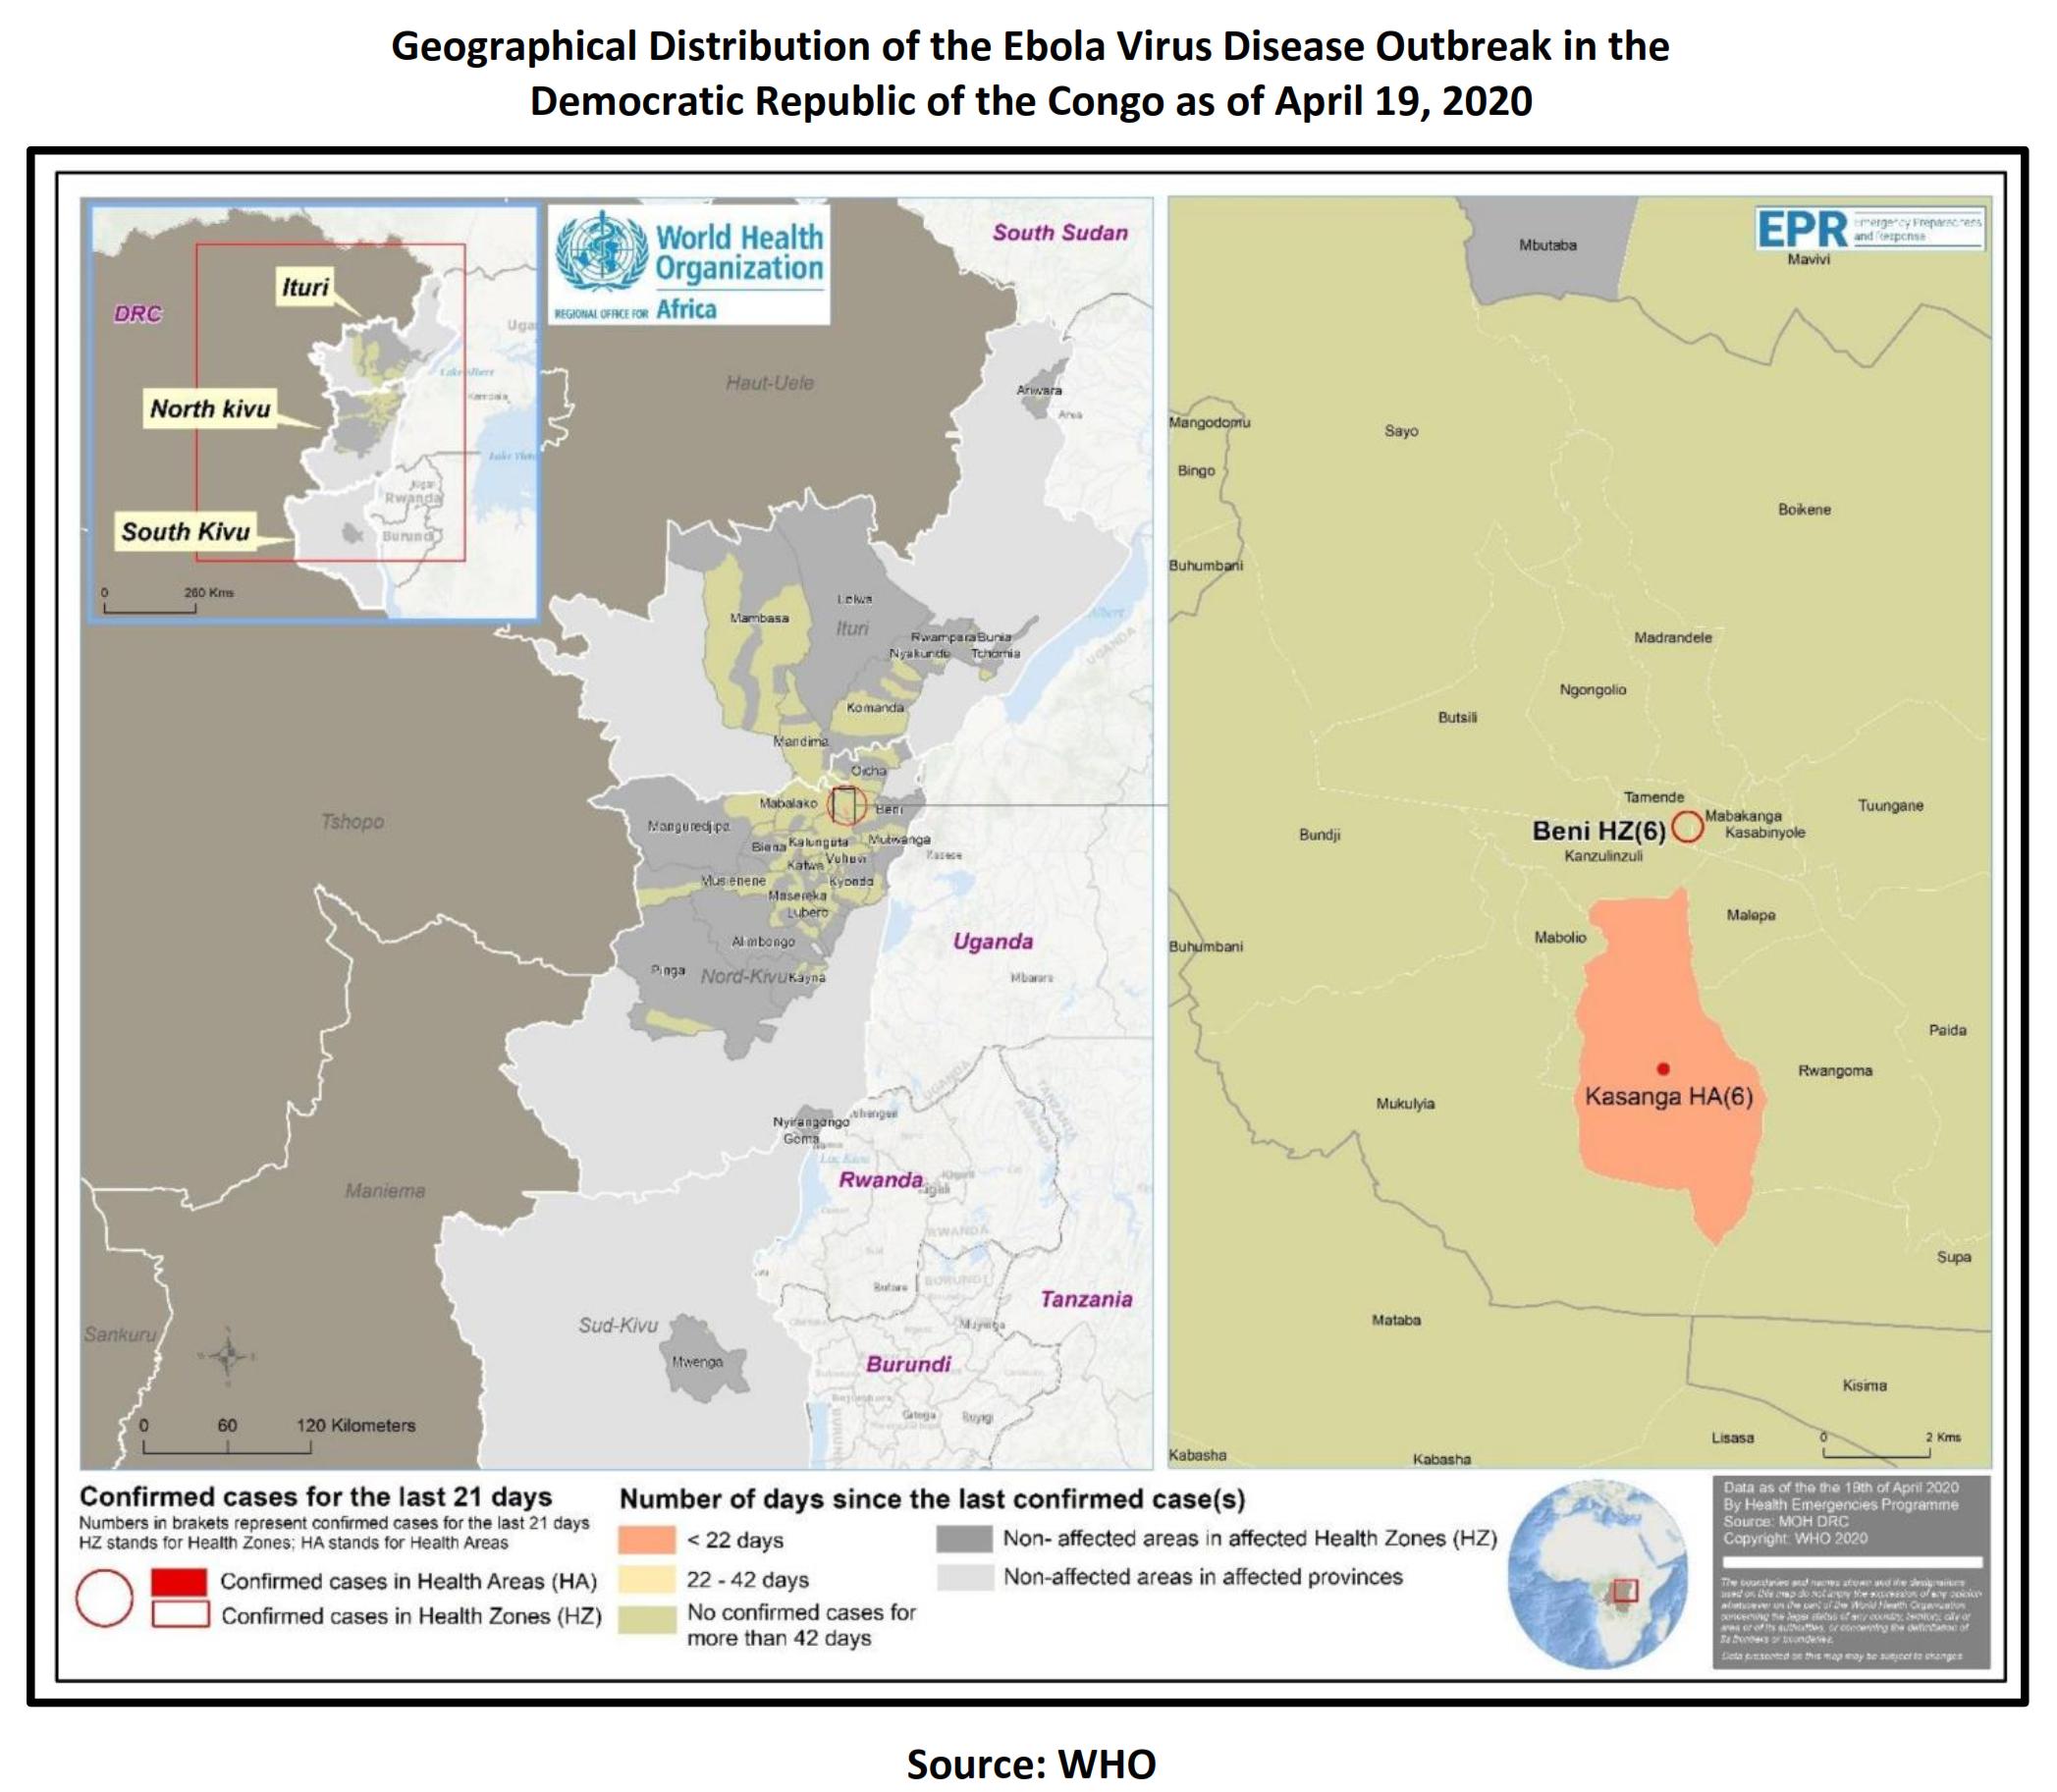 Ebola Virus Disease Outbreak